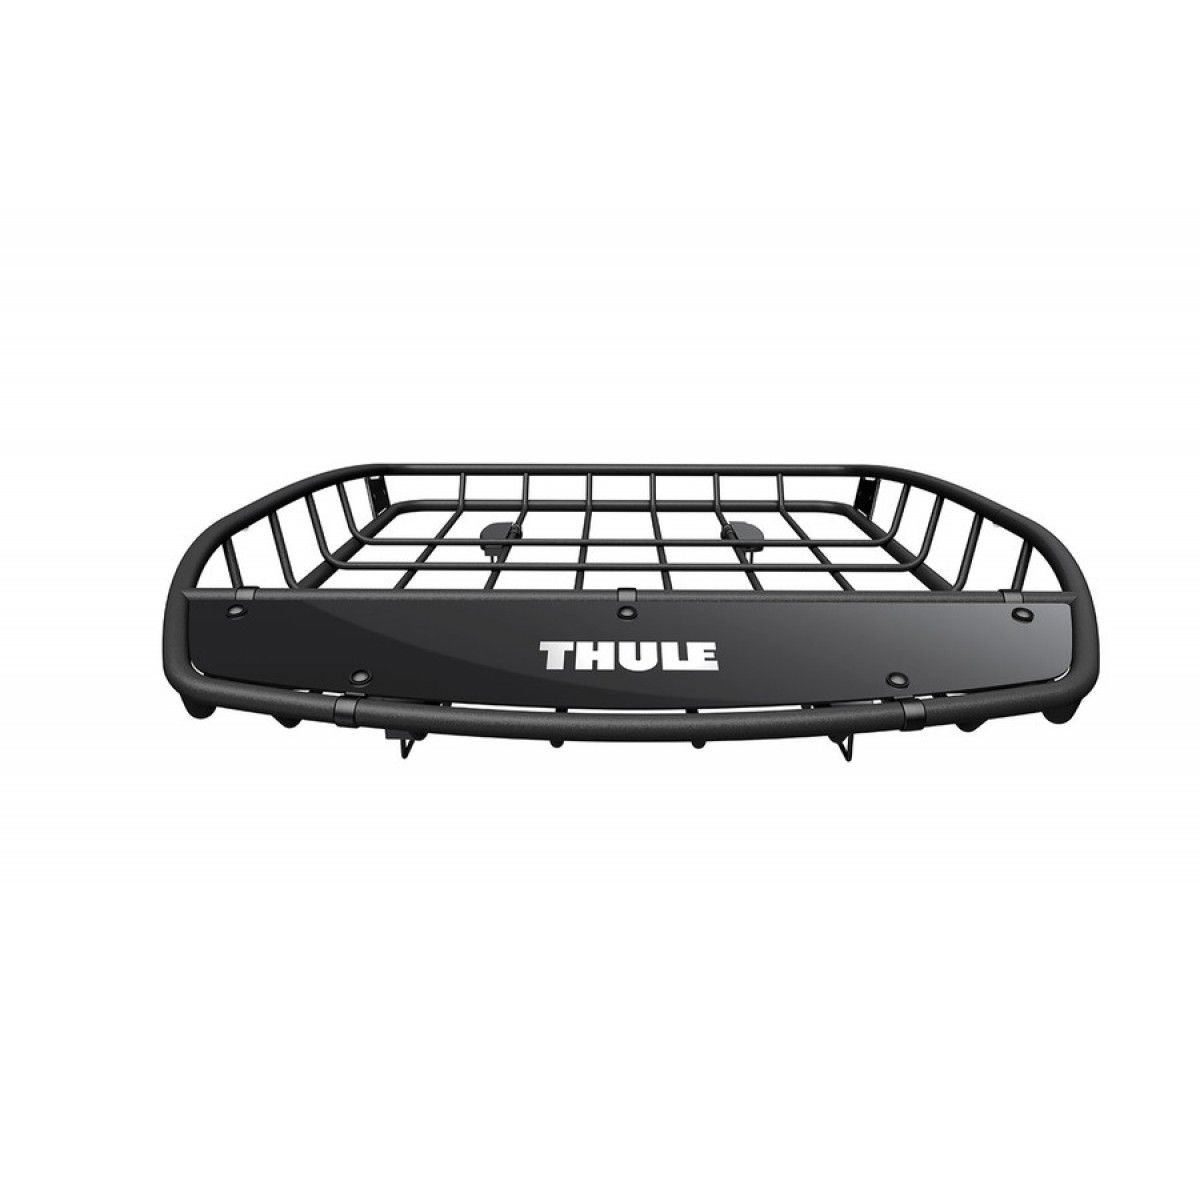 Thule Canyon 859 Roof Basket Thule Roof Rack Car Roof Racks